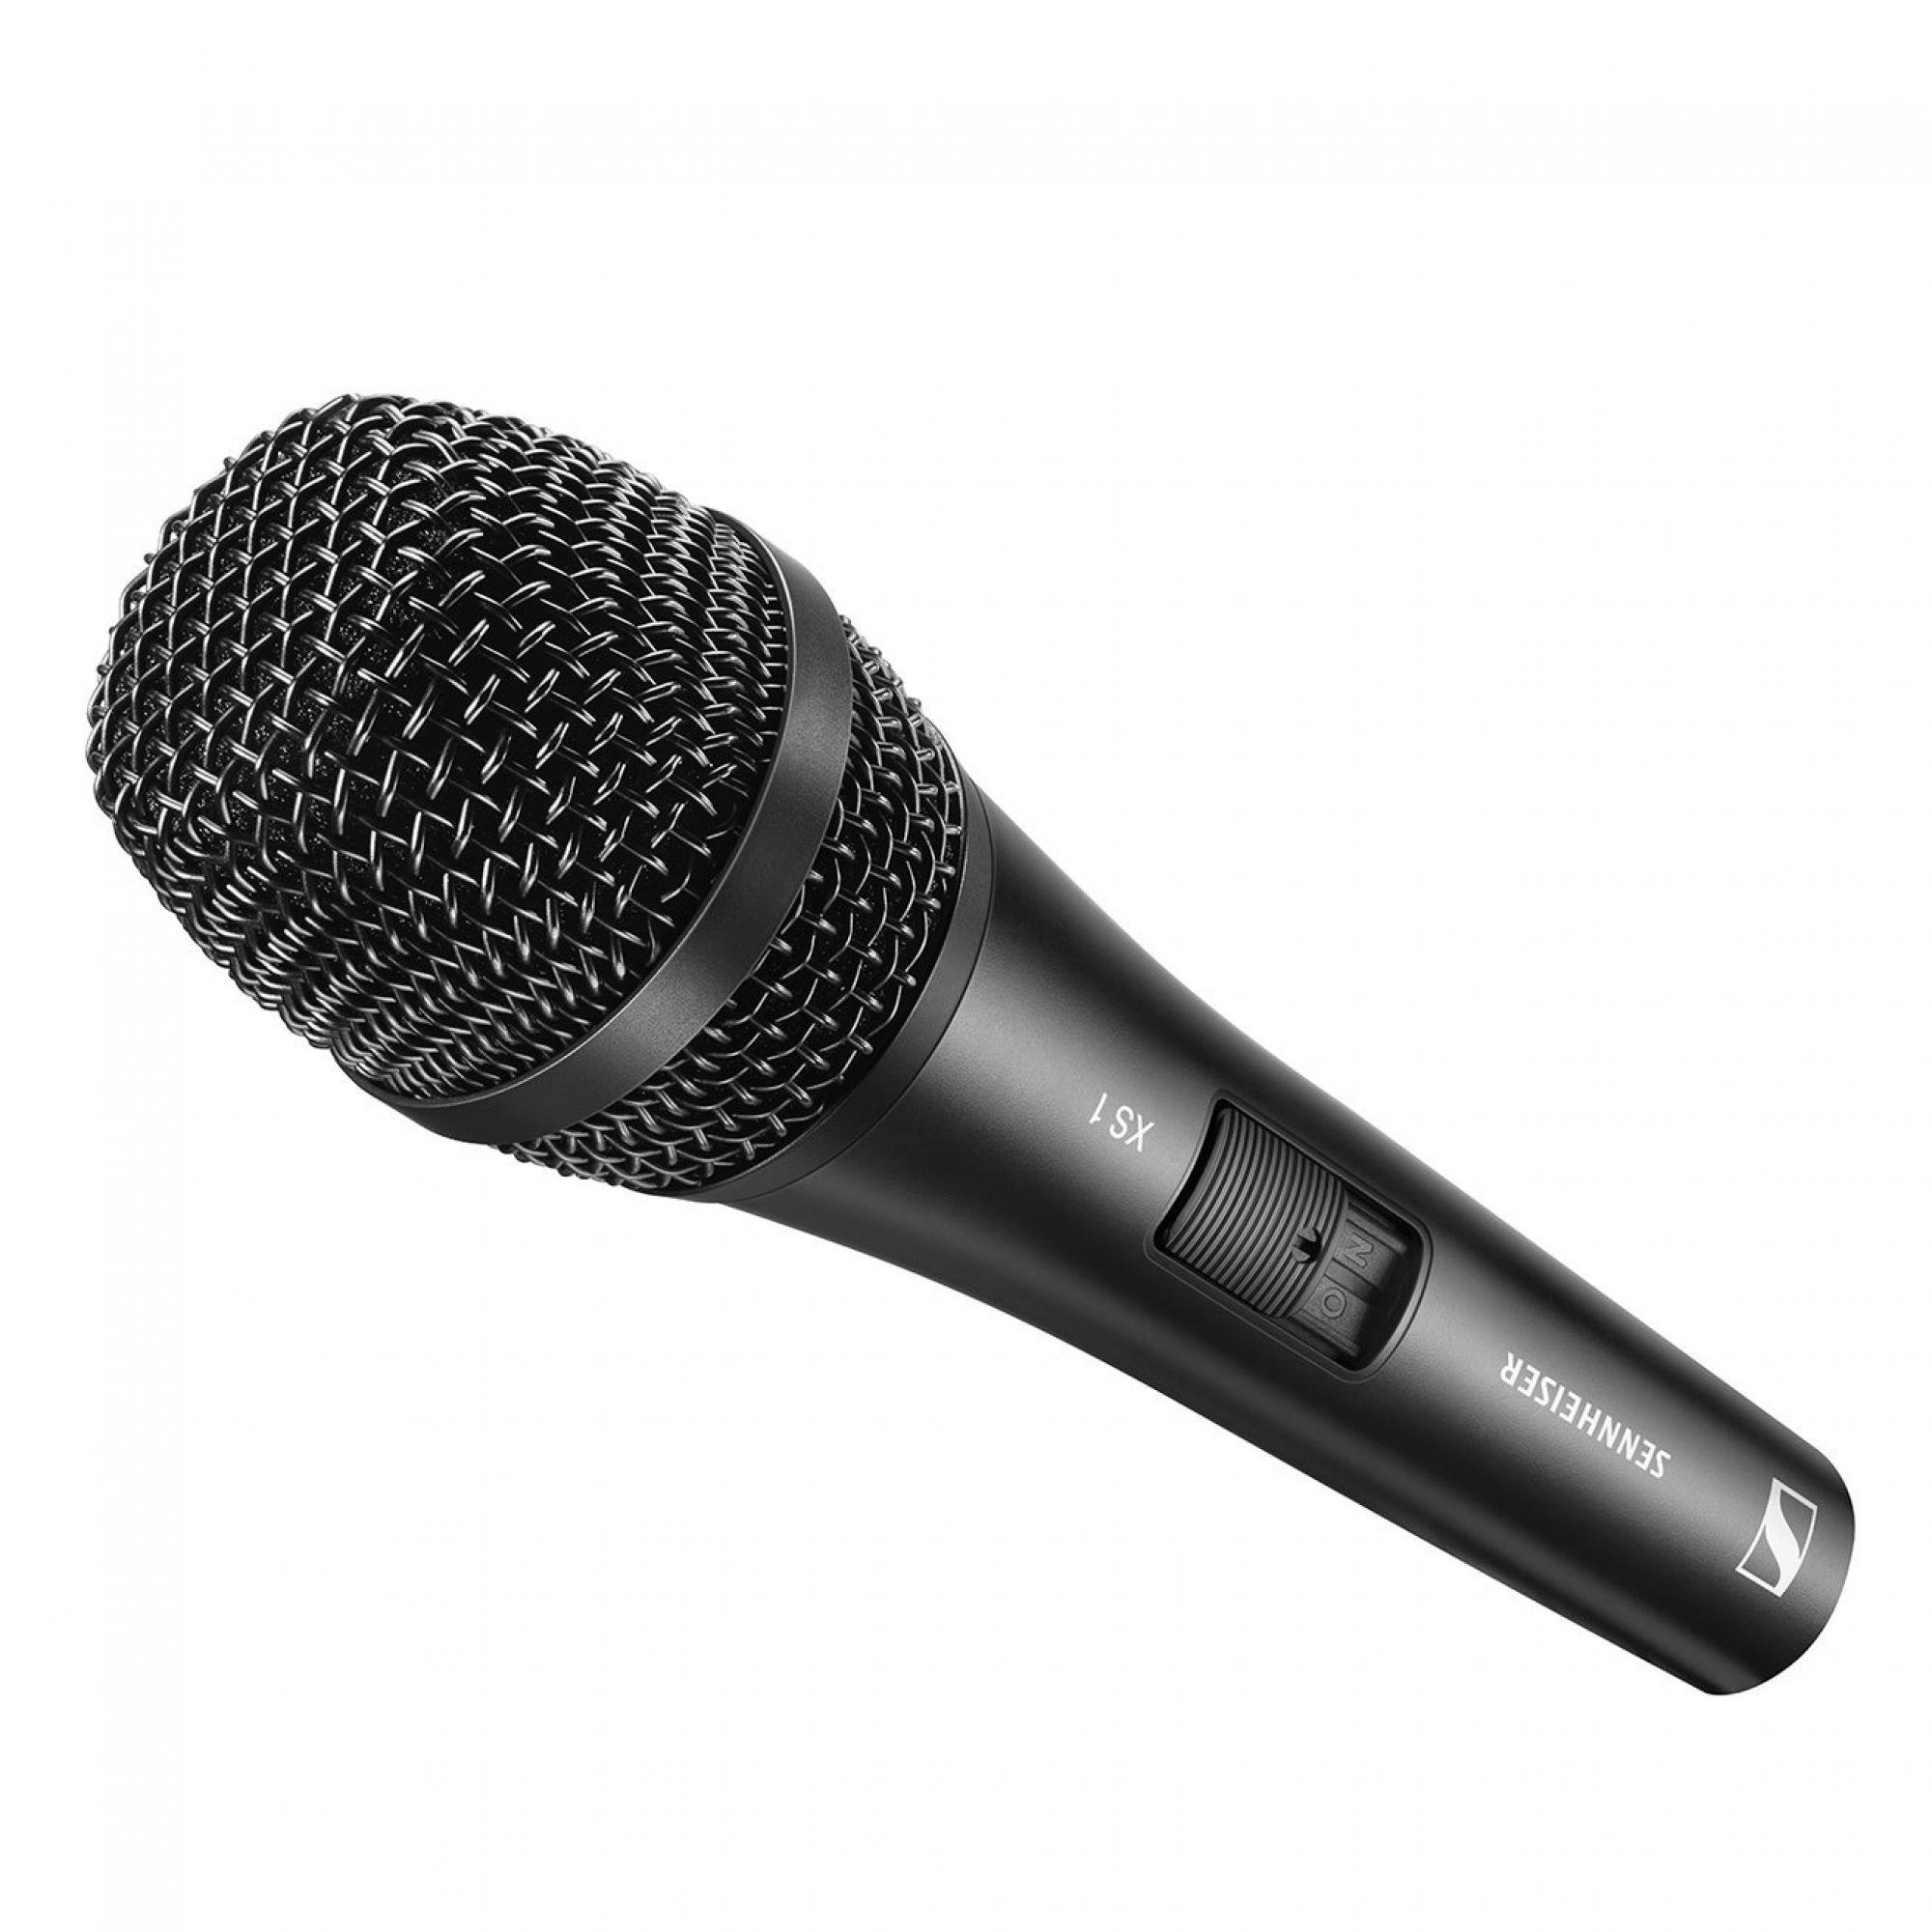 Microfone Cardióide XS1 SENNHEISER